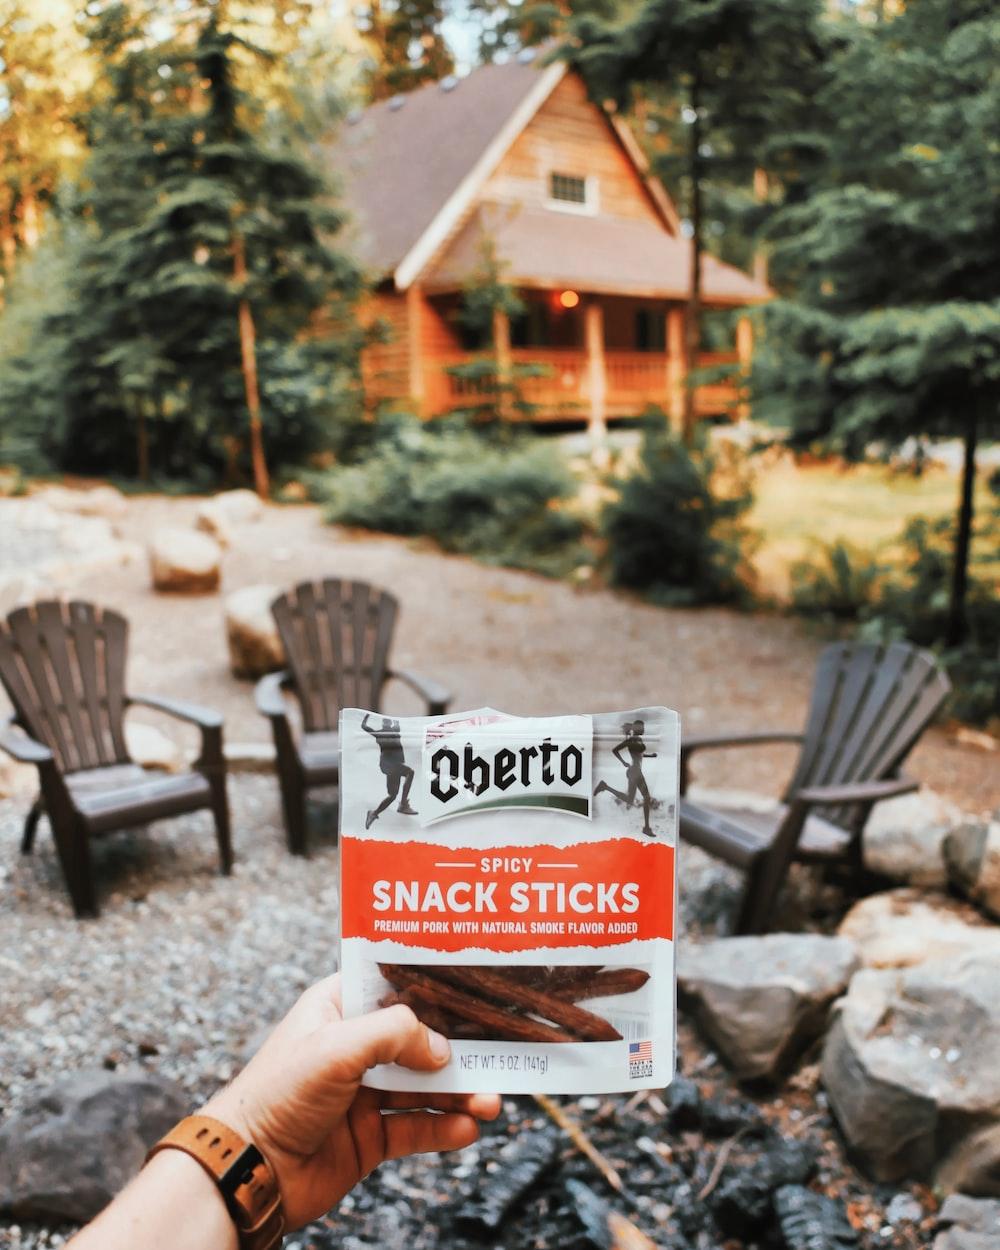 Cherto spicy snack sticks pack